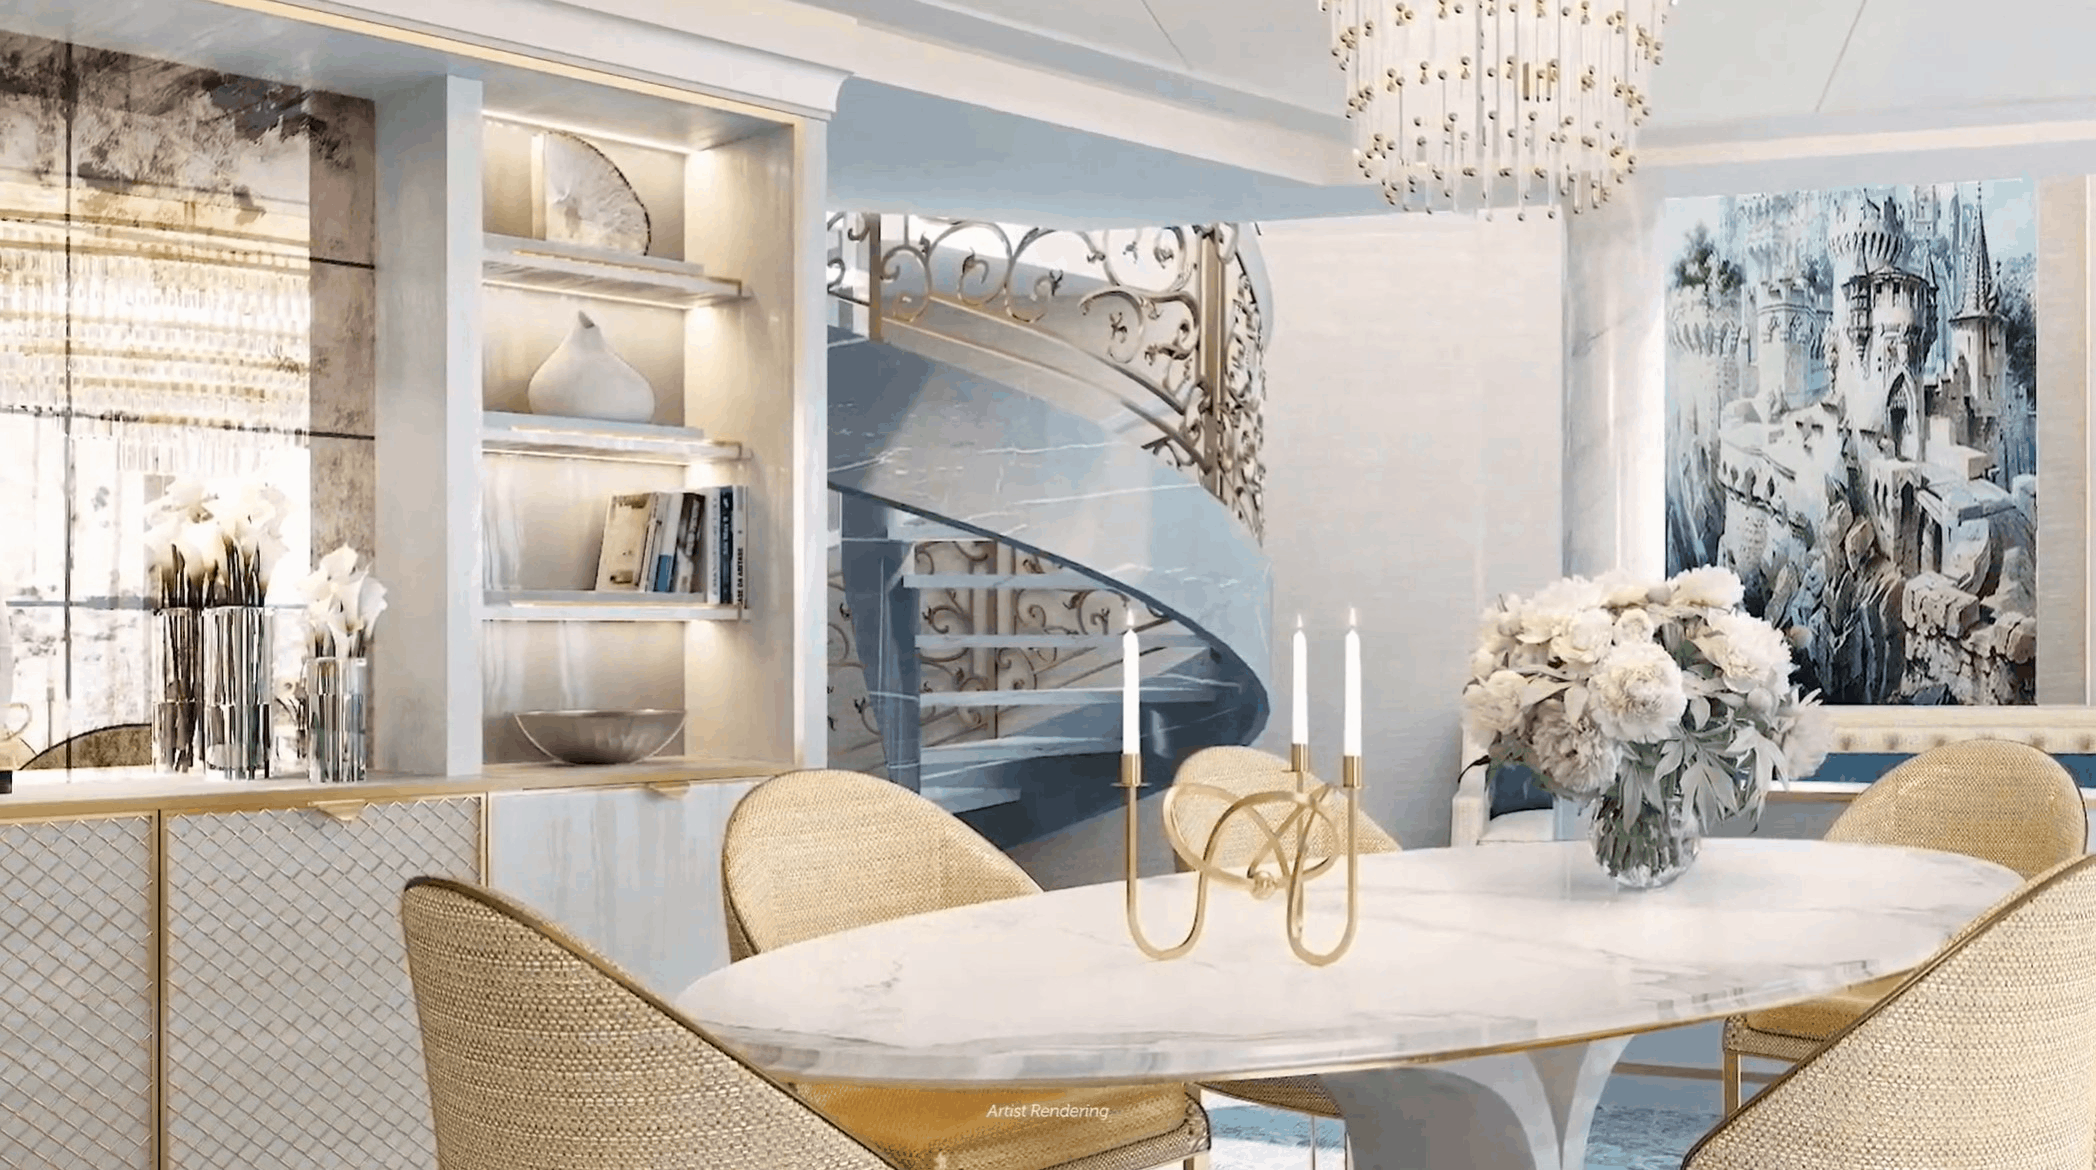 2-story suite Disney Wish